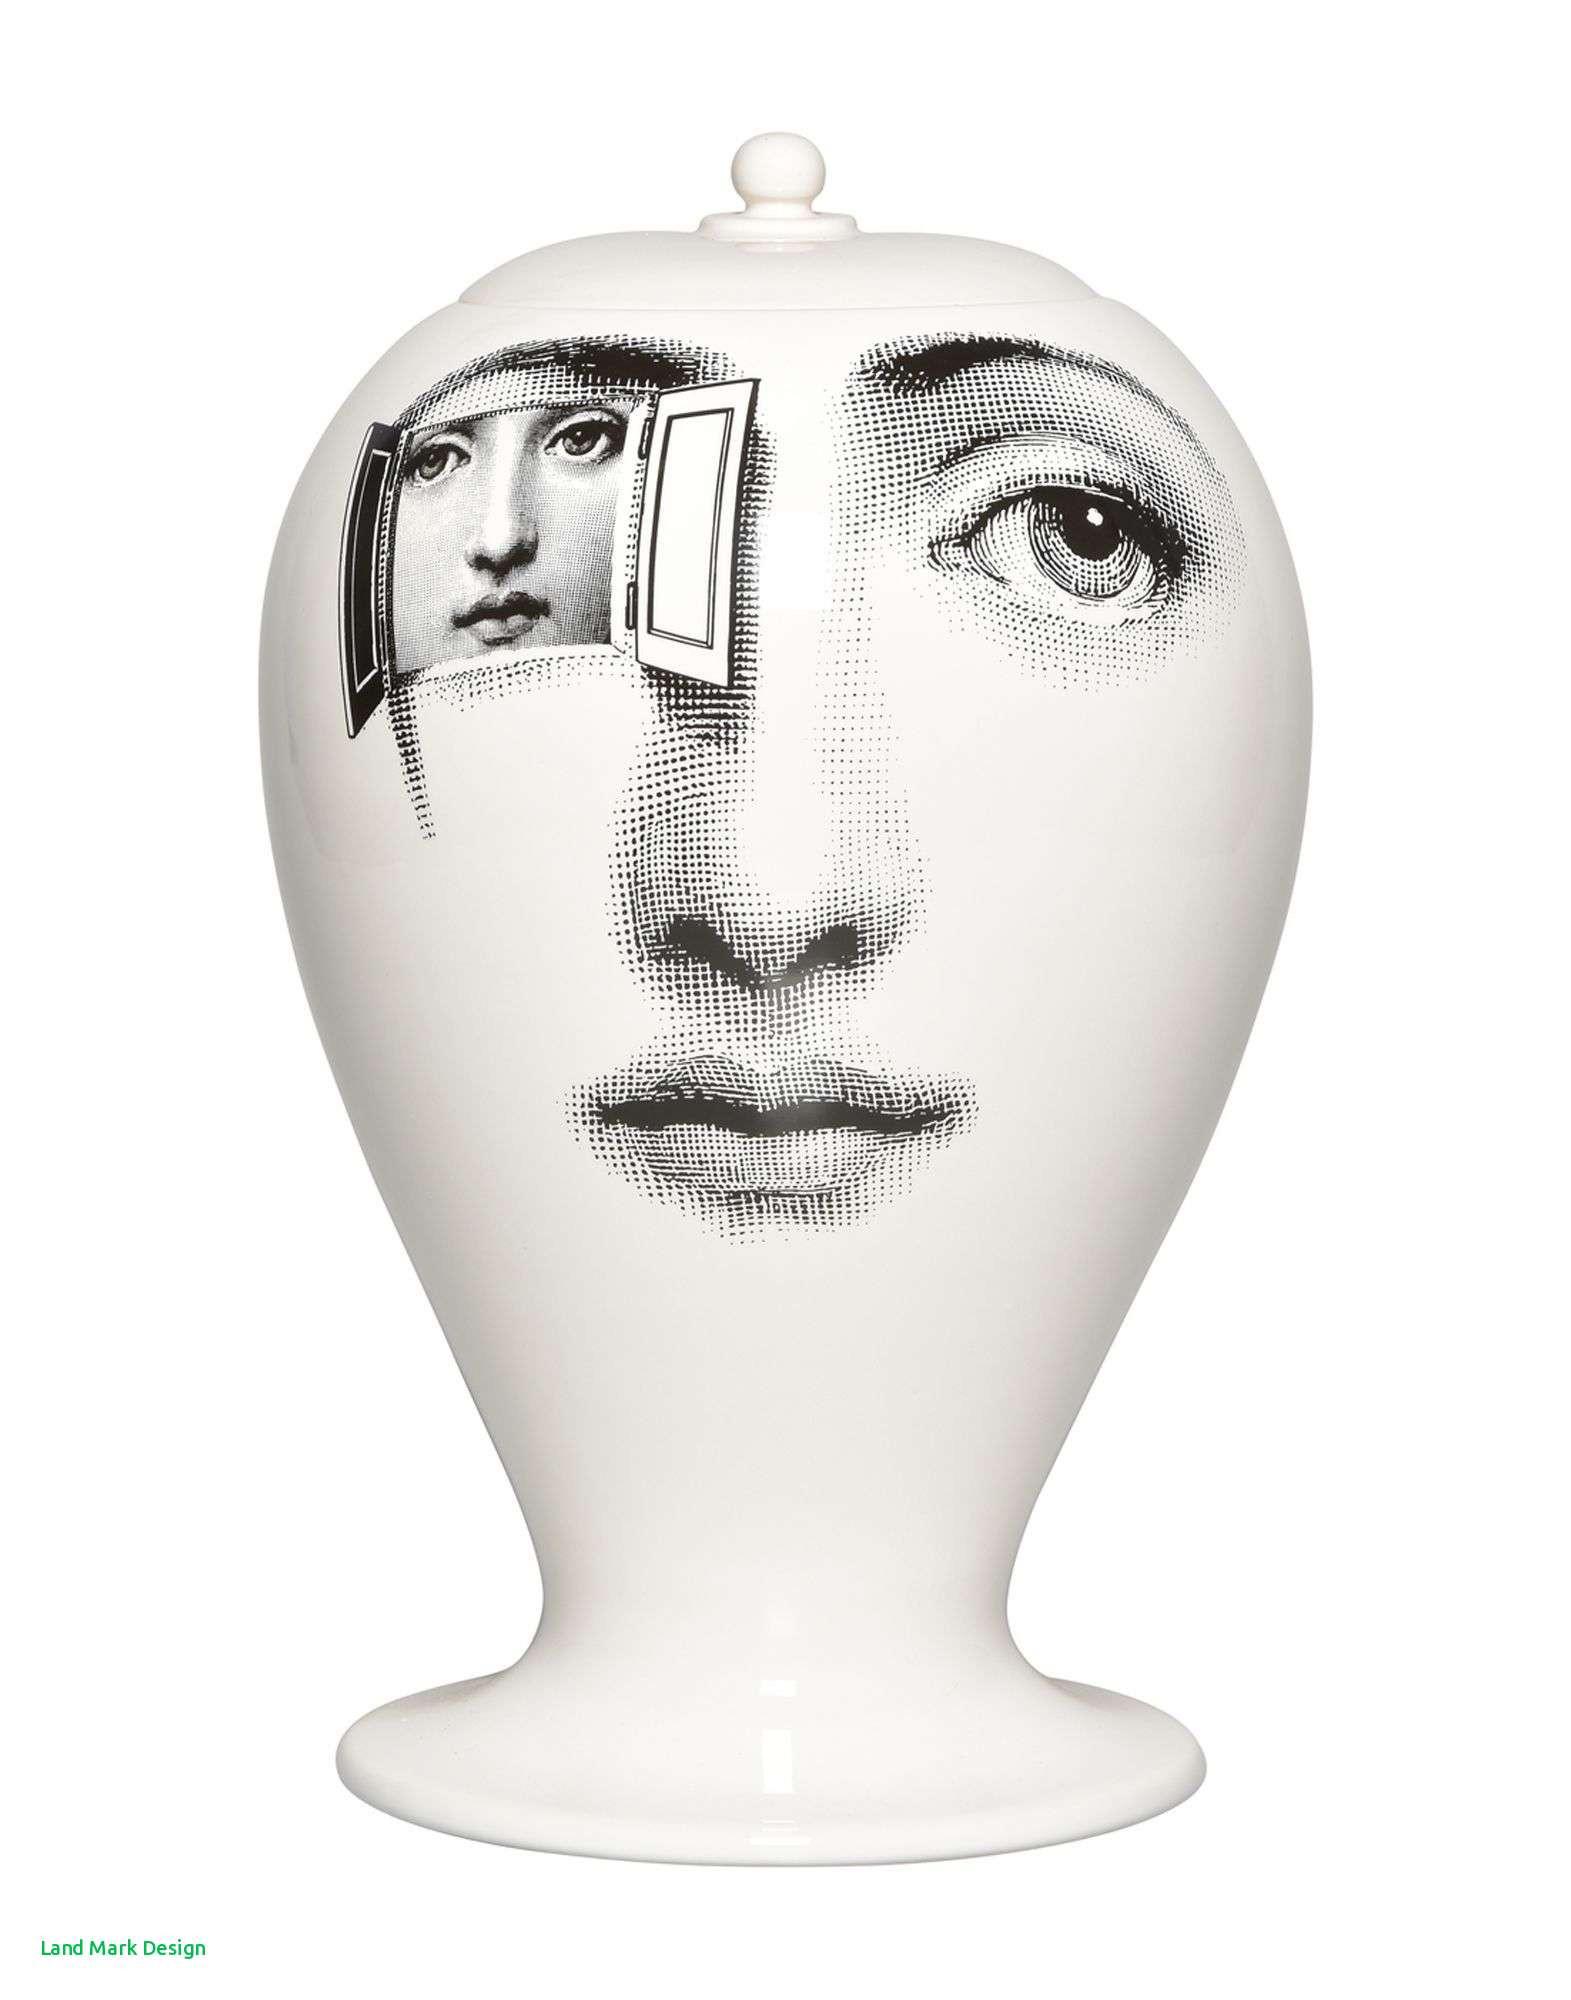 fornasetti perpetual face vase of fornasetti faces design home design regarding 27045897 1 x jpg version 1400270240 width 1600 format pjpg auto webph vases fornasetti vase piero